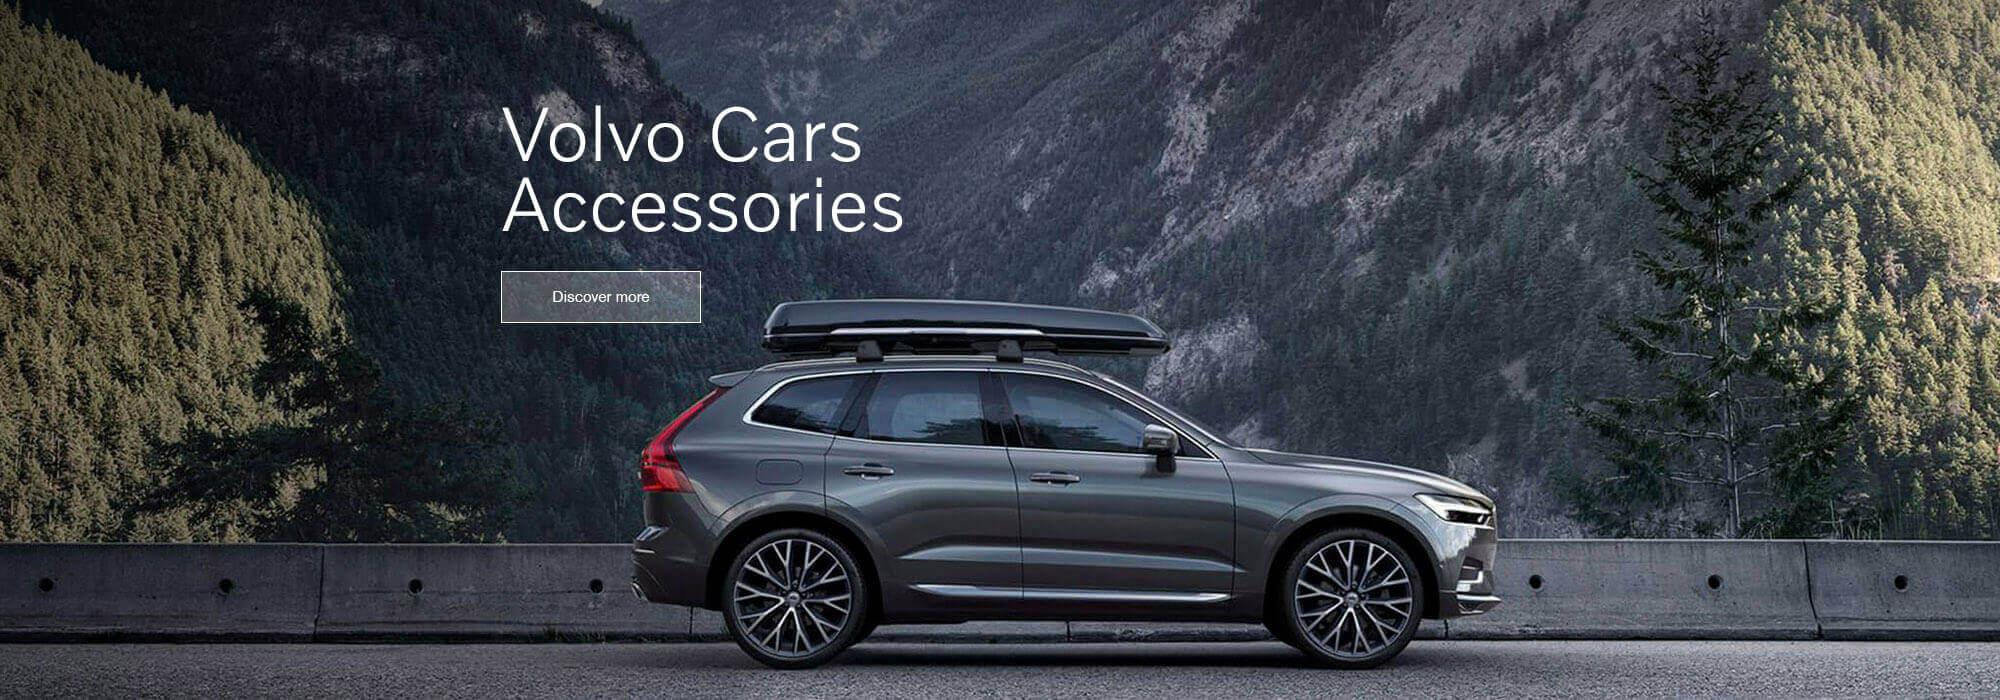 Volvo Cars Accessories